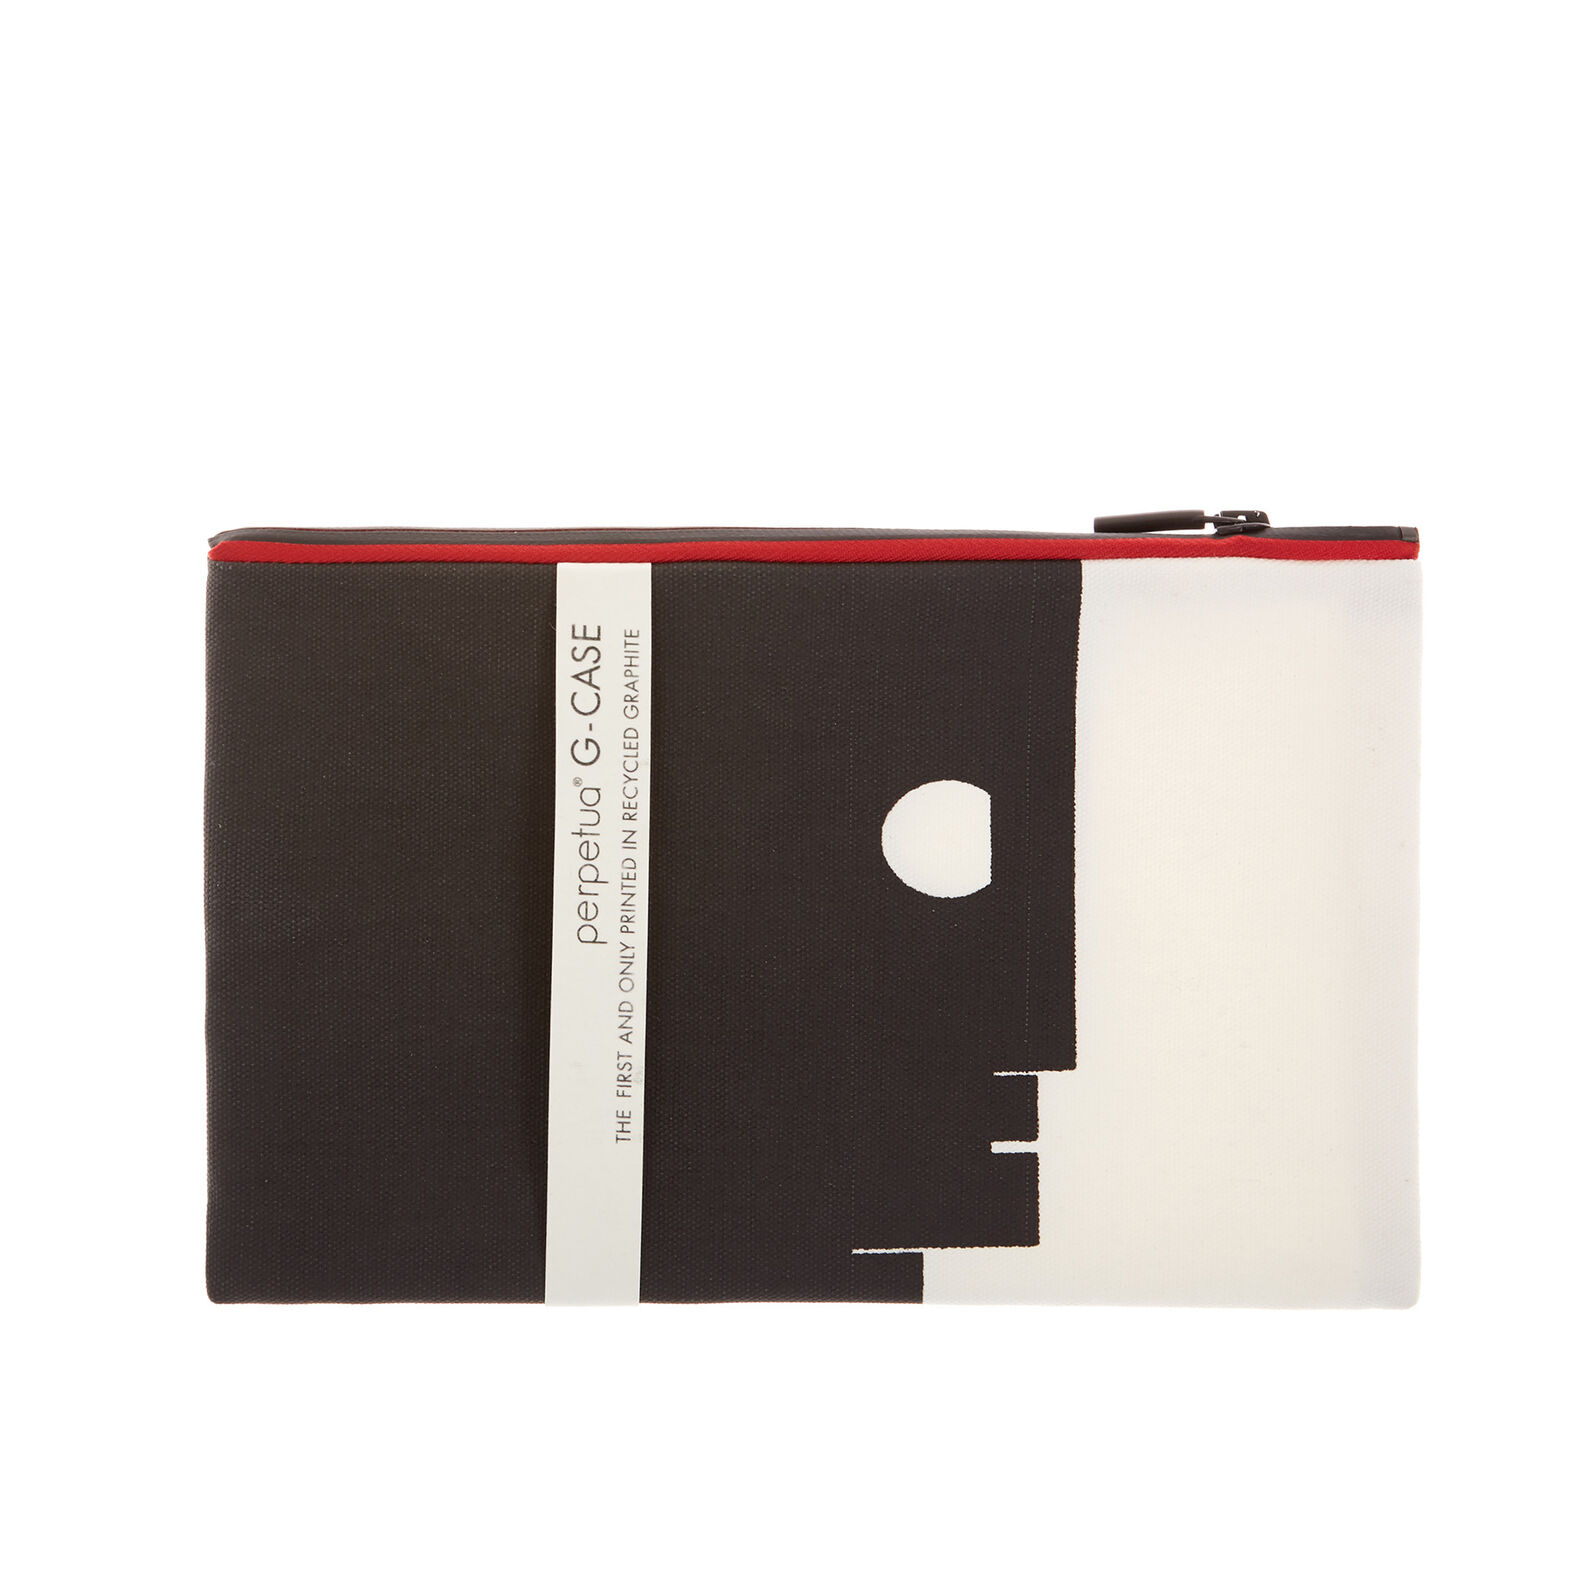 Perpetua pencil case in cotton fabric